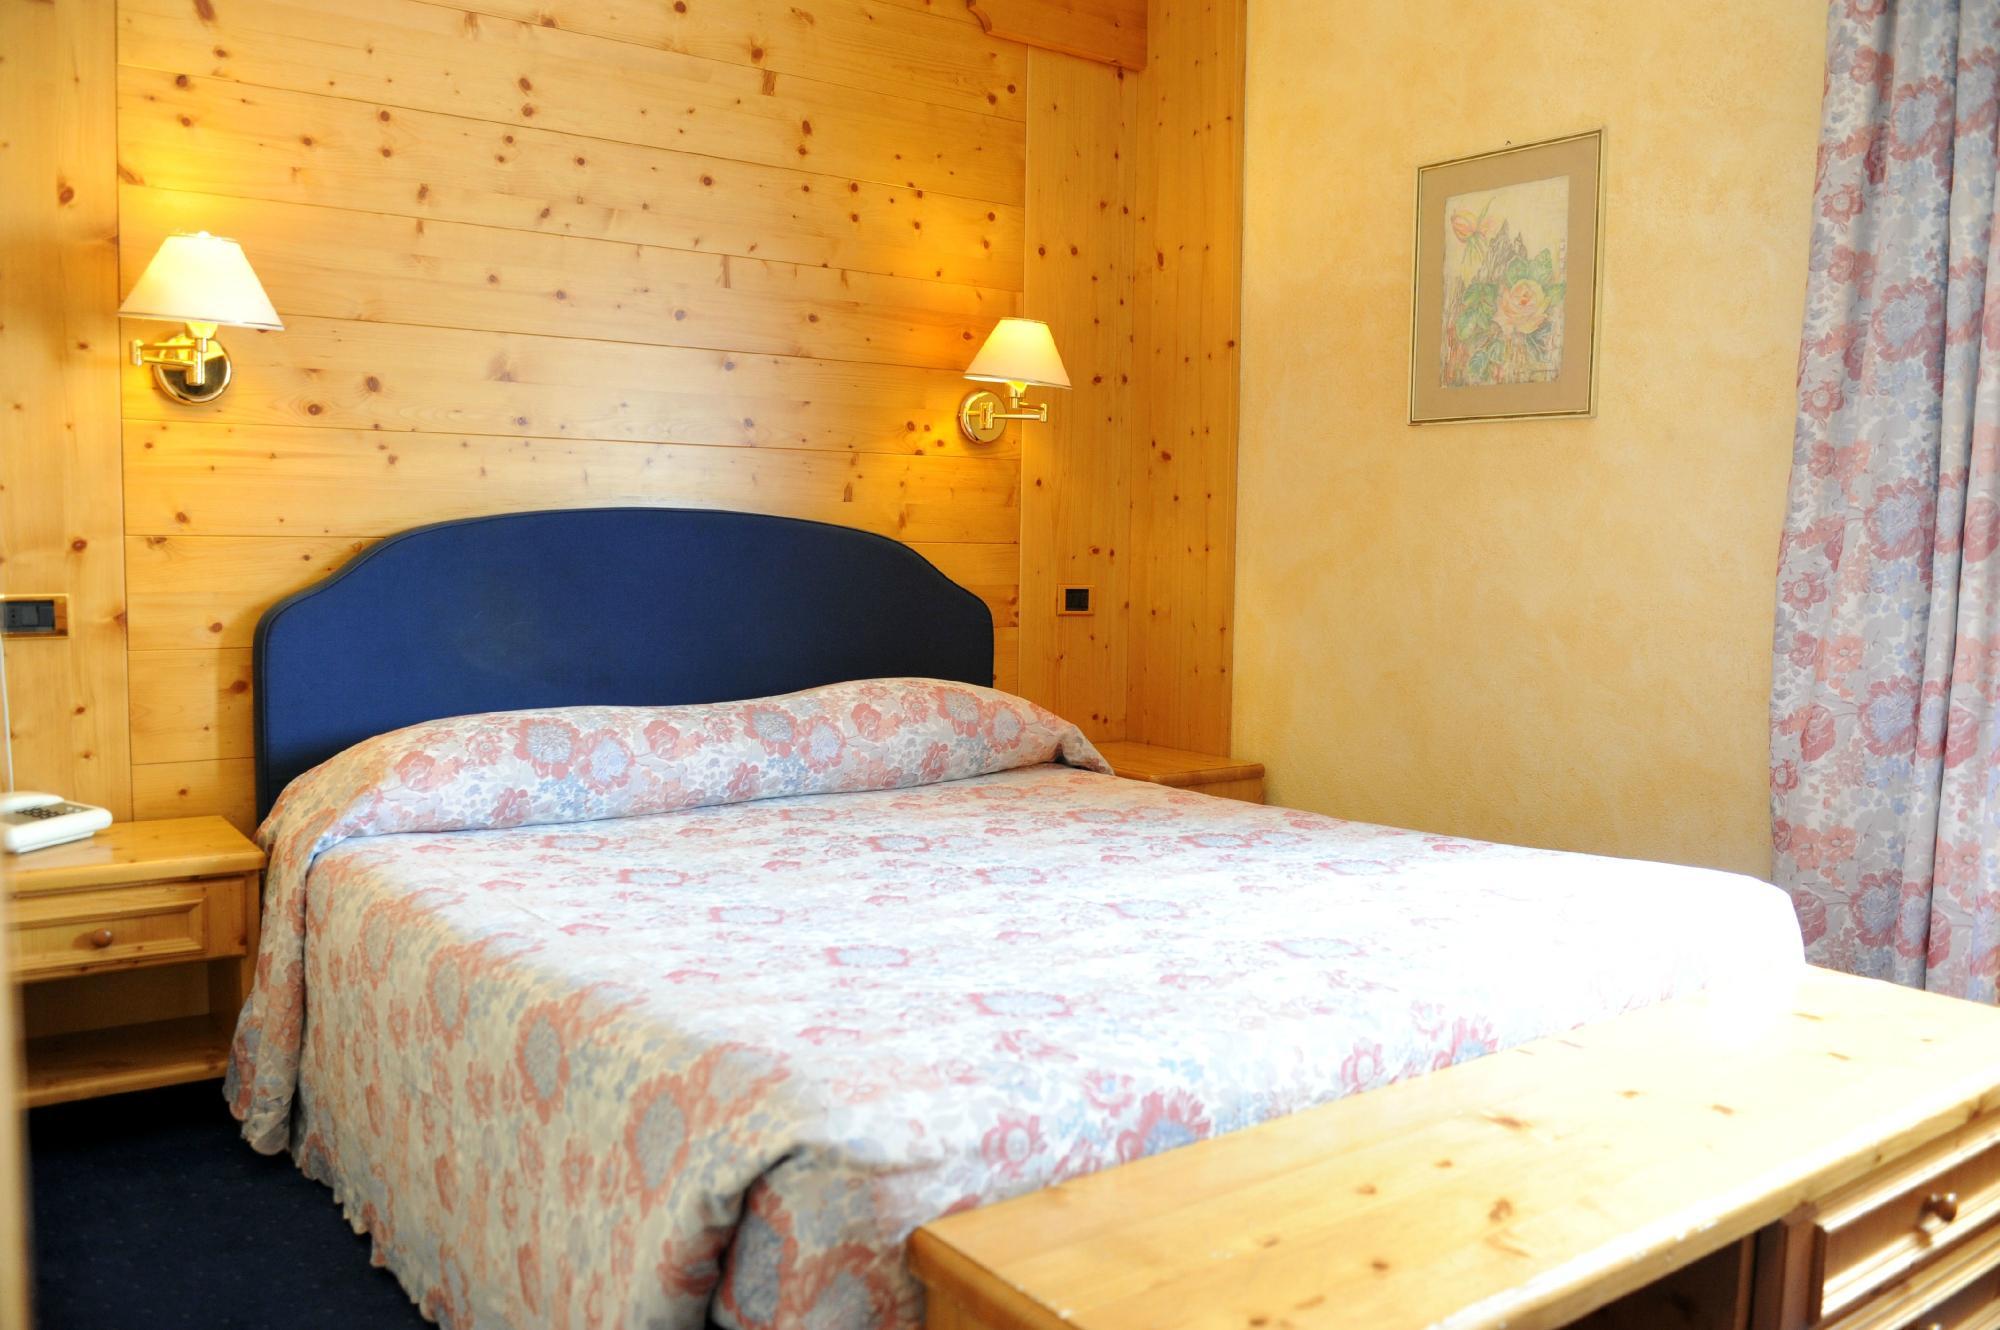 Miramonti park hotel bormio italy reviews photos for Hotel meuble sertorelli